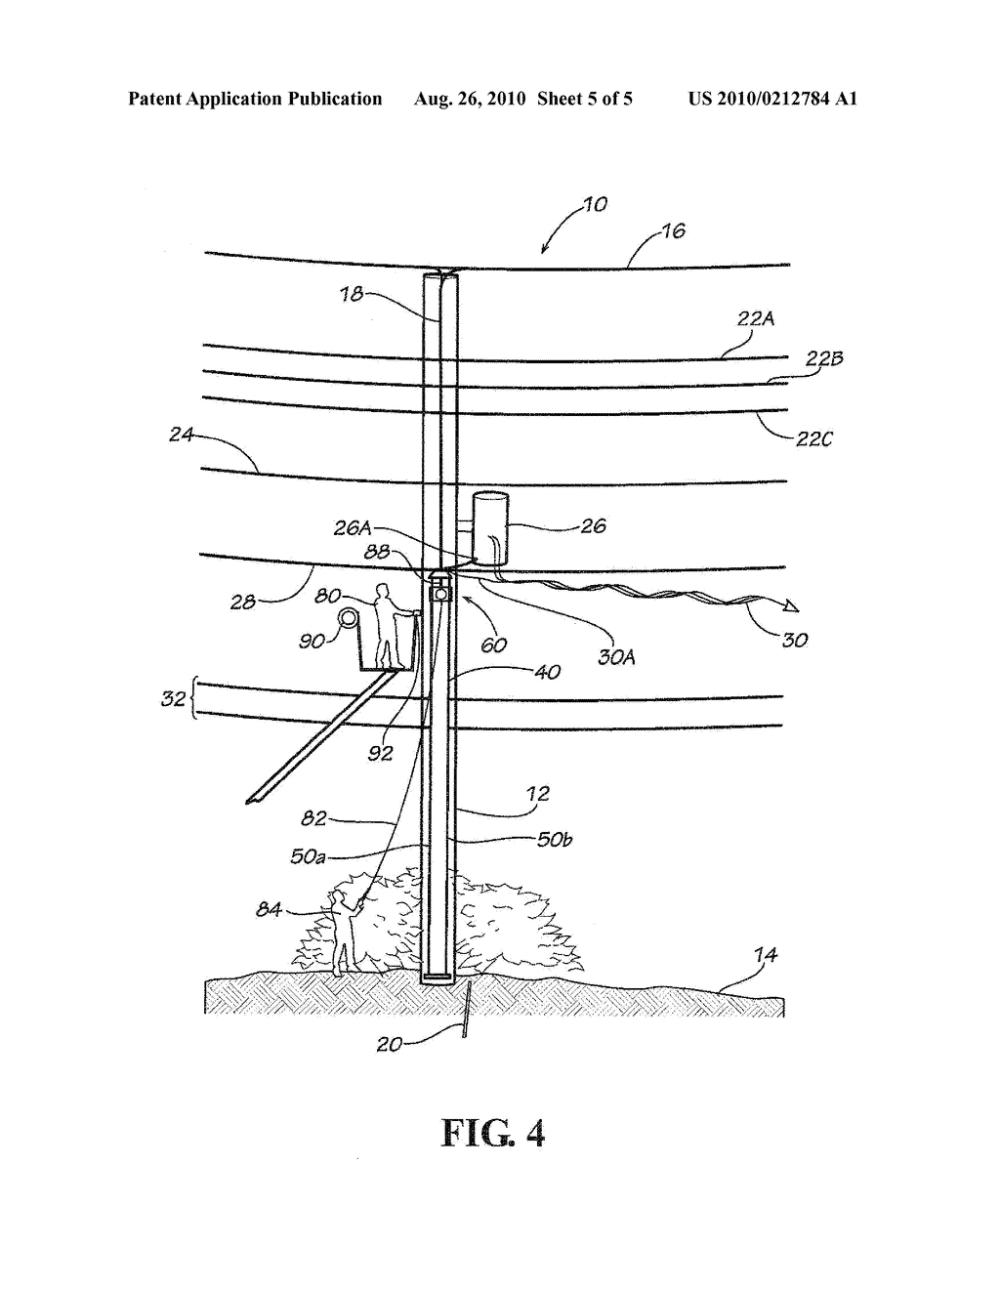 medium resolution of power pole anchor wiring diagram wiring library rh 93 skriptoase de electrical schematic parts of a utility pole